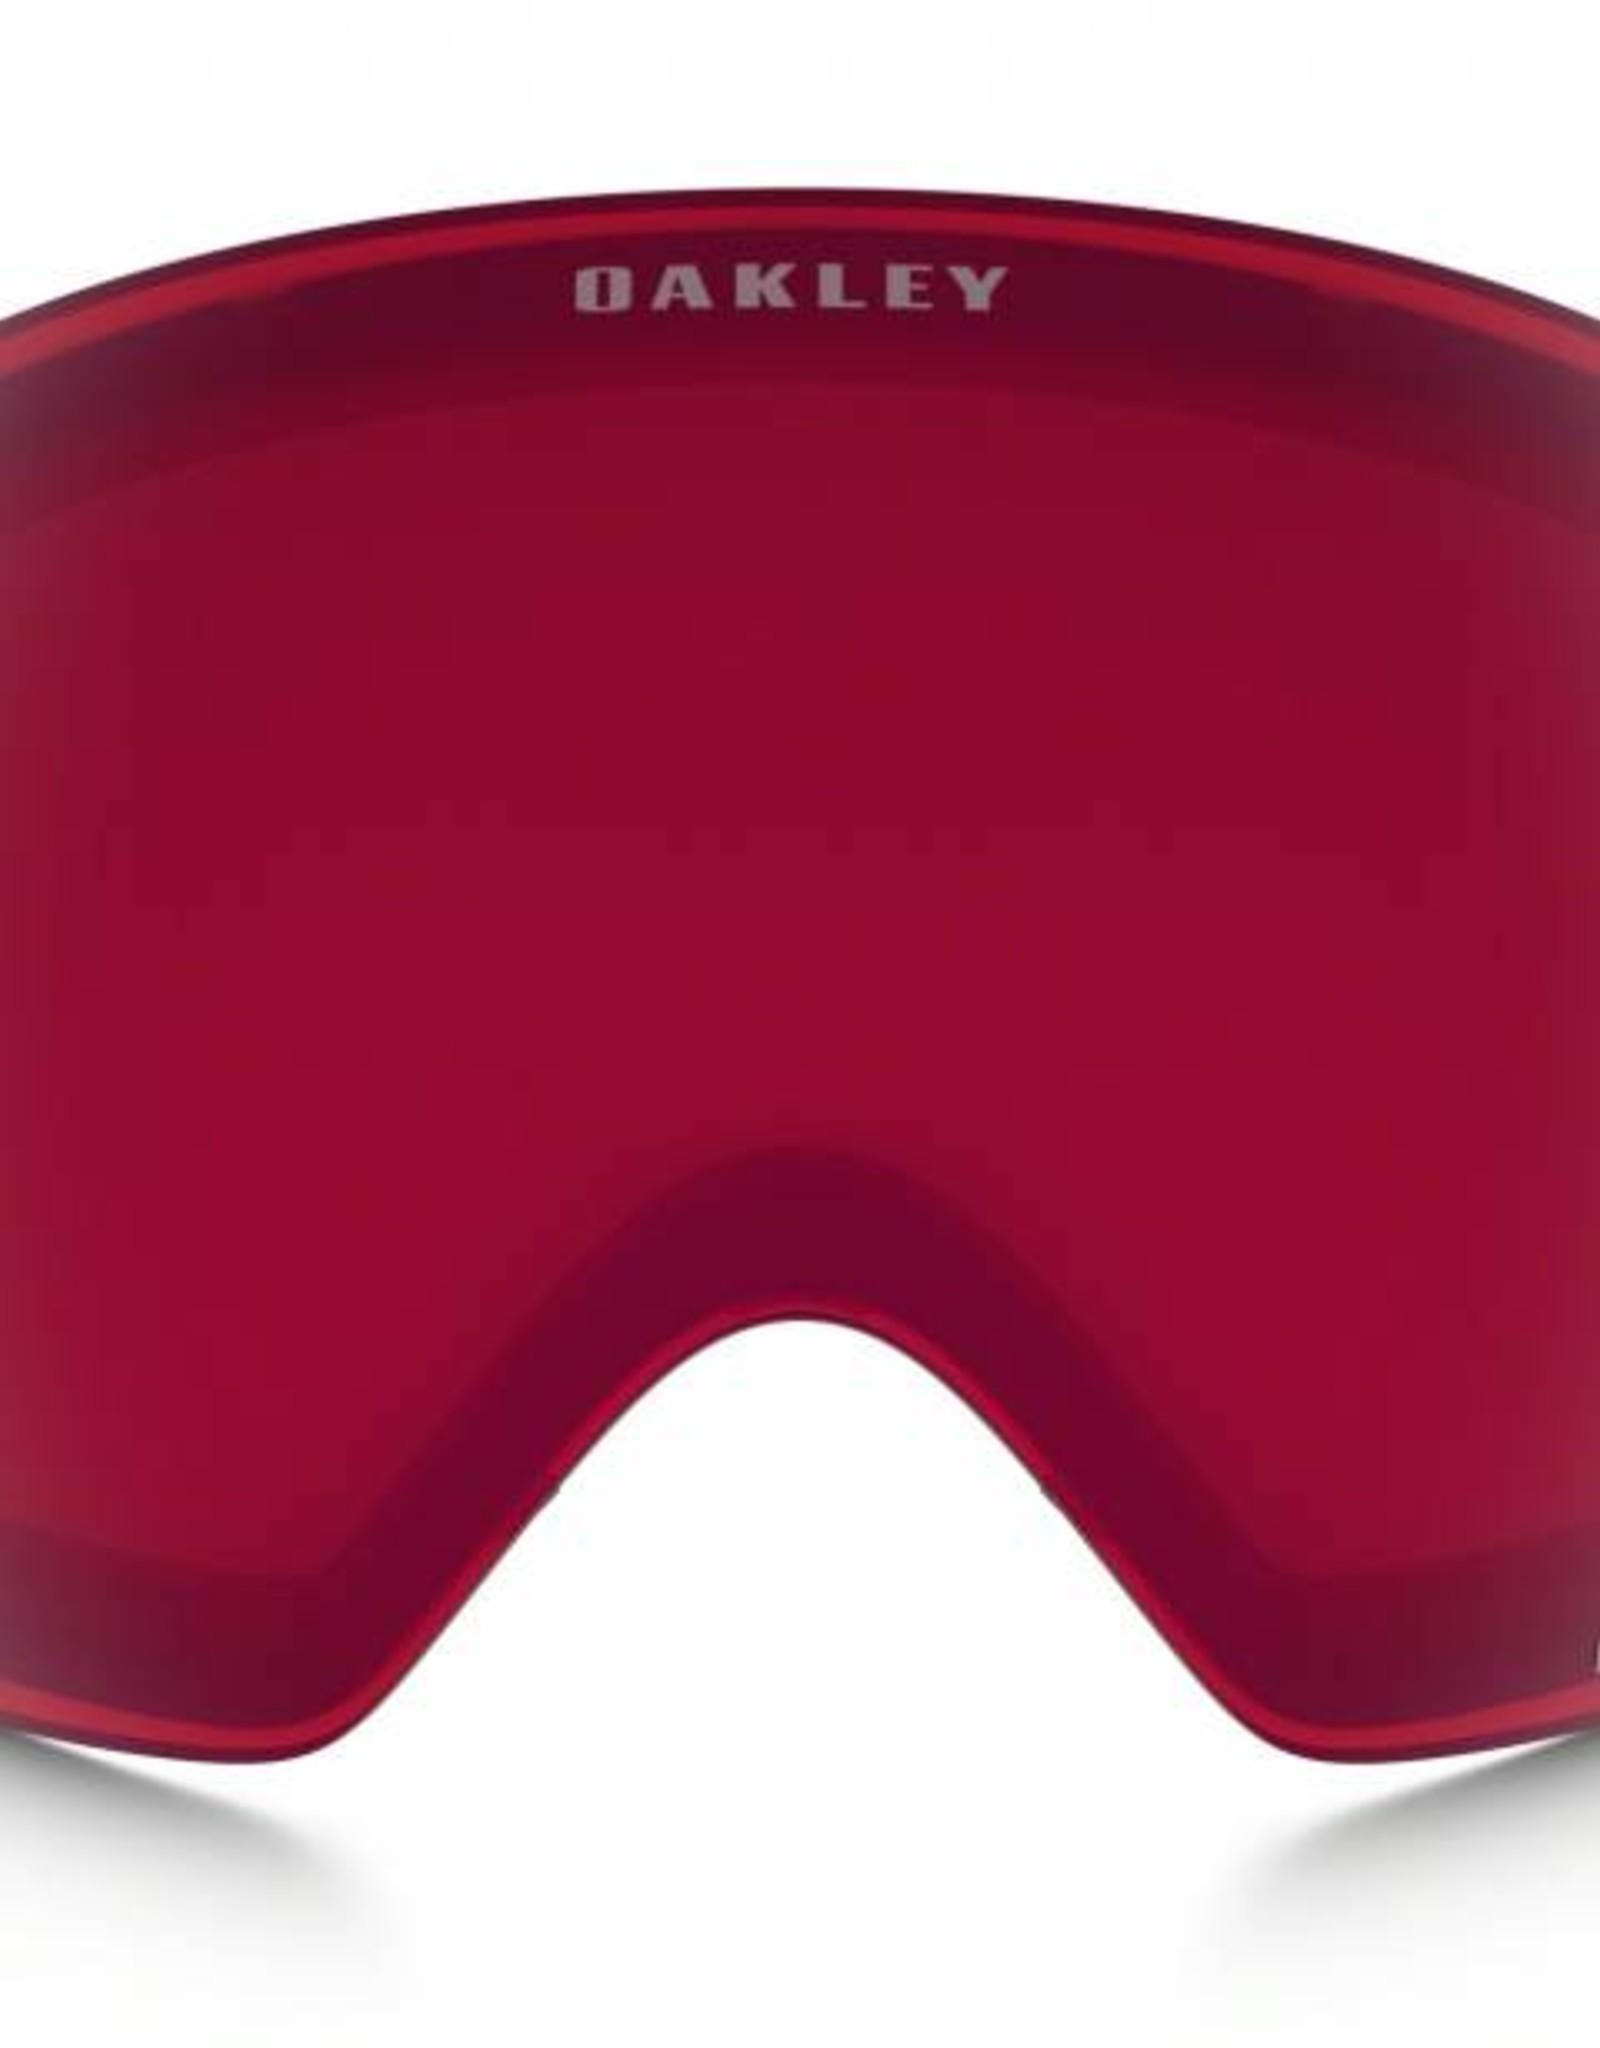 Oakley Oakley - FLIGHT DECK REPLACEMENT LENS - PRIZM Rose